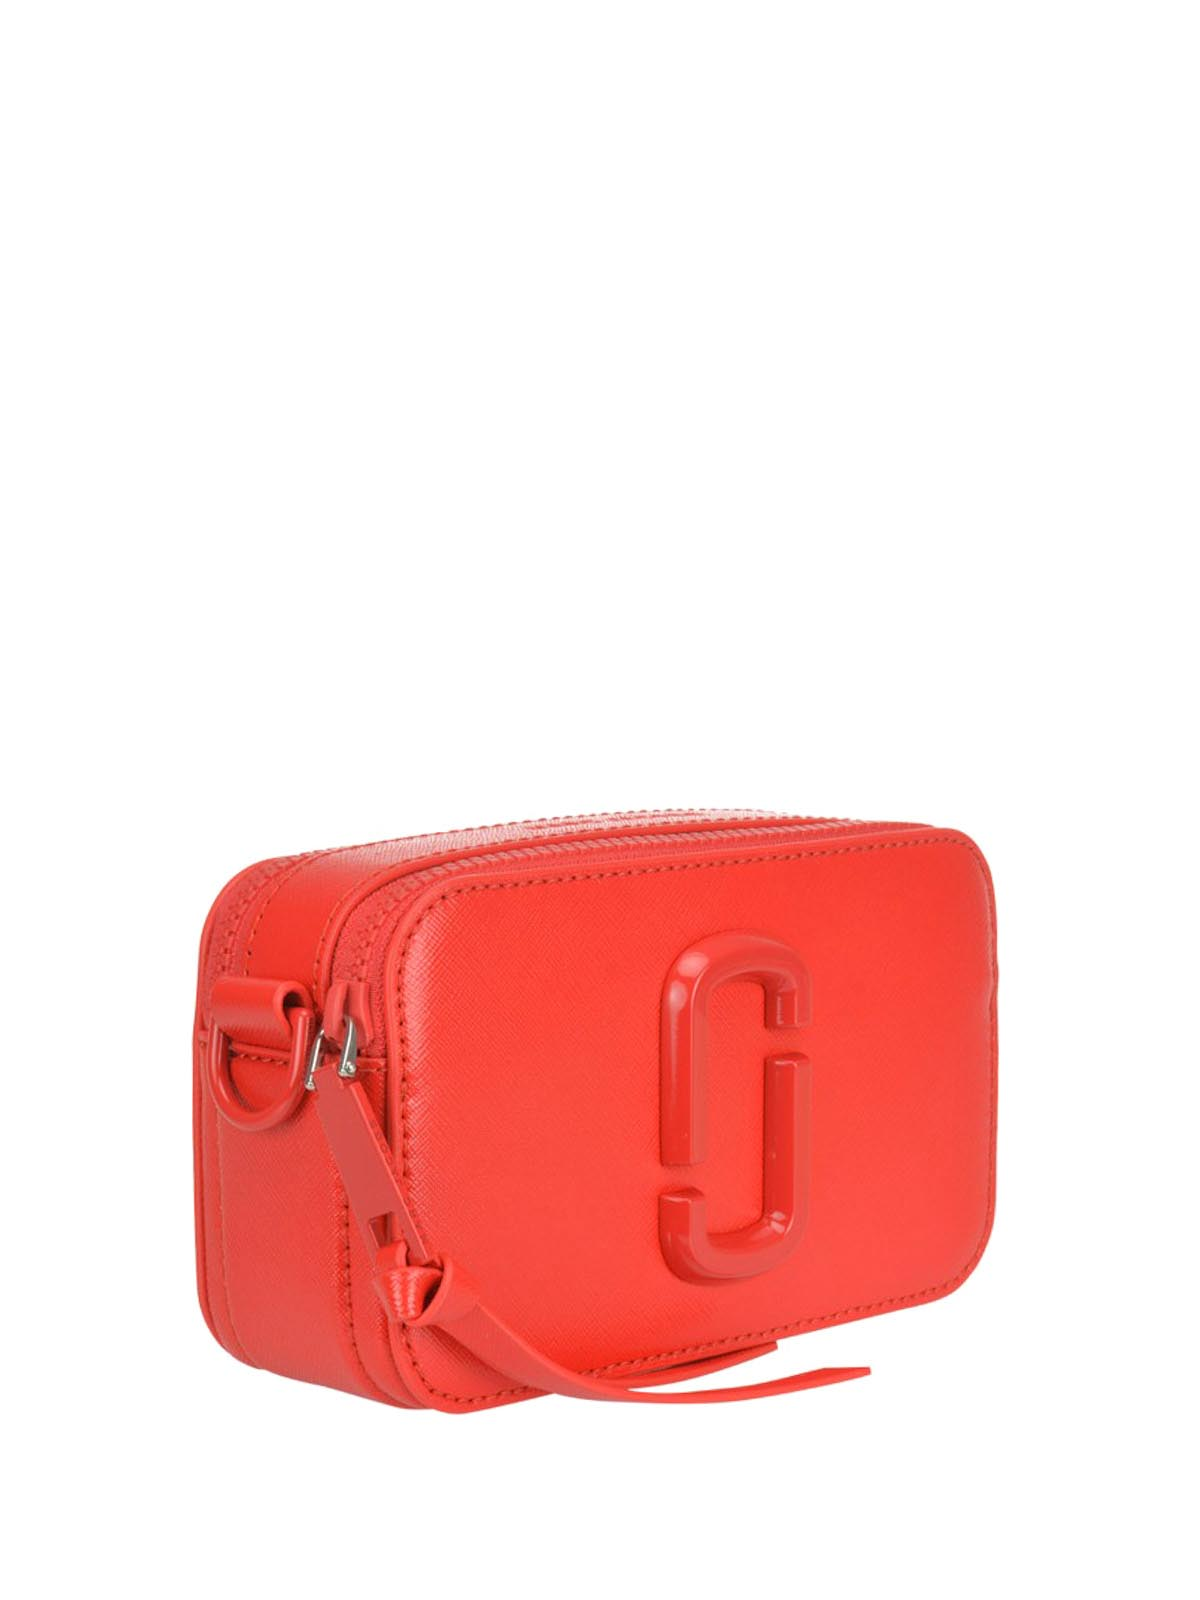 Marc Jacobs - Snapshot DTM red bag - cross body bags - M0014867612